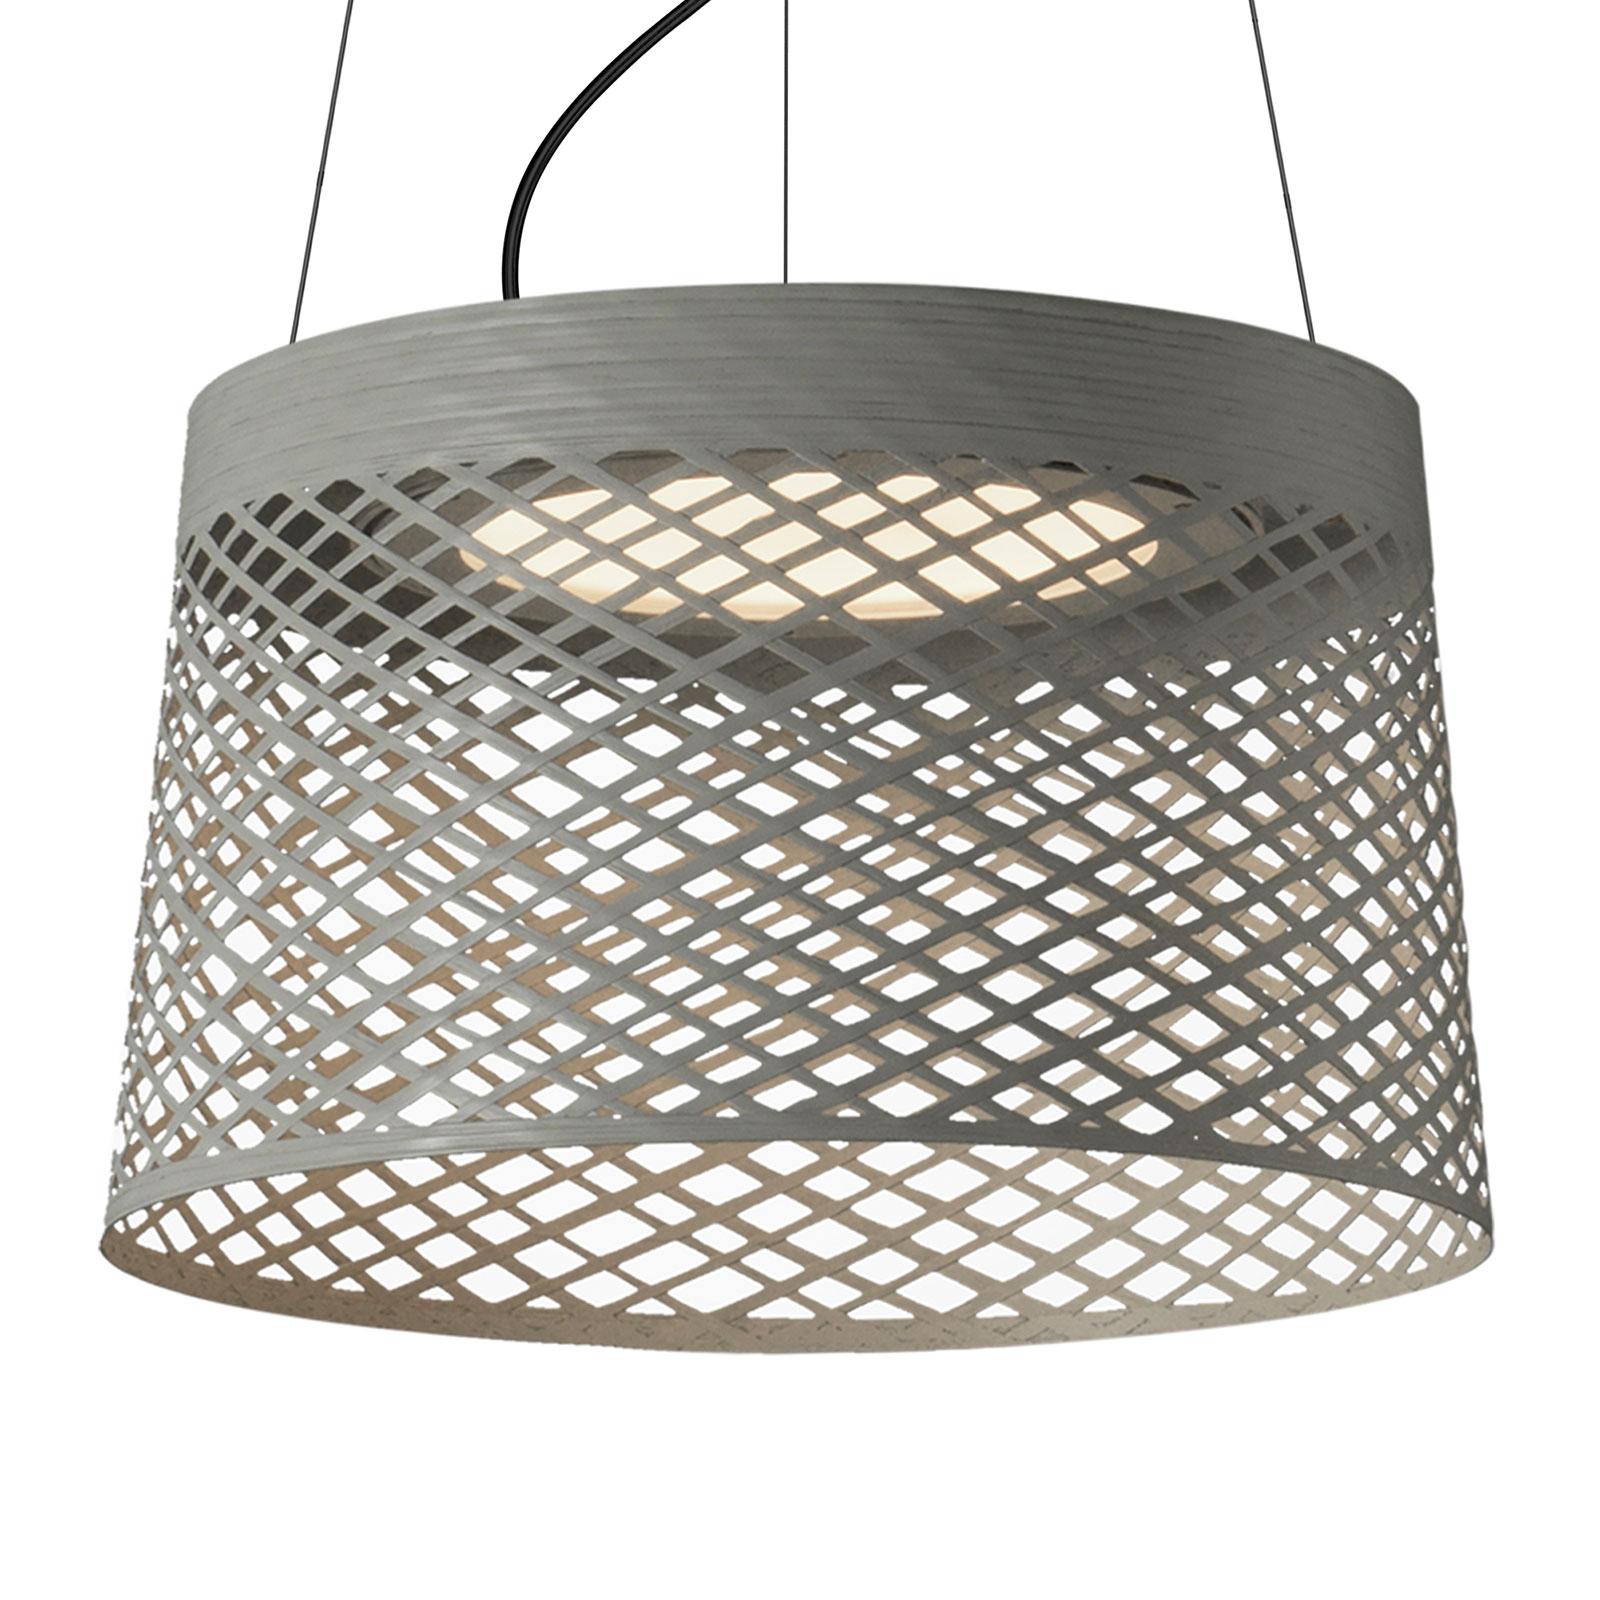 Foscarini Twiggy Grid - LED hanglamp, greige